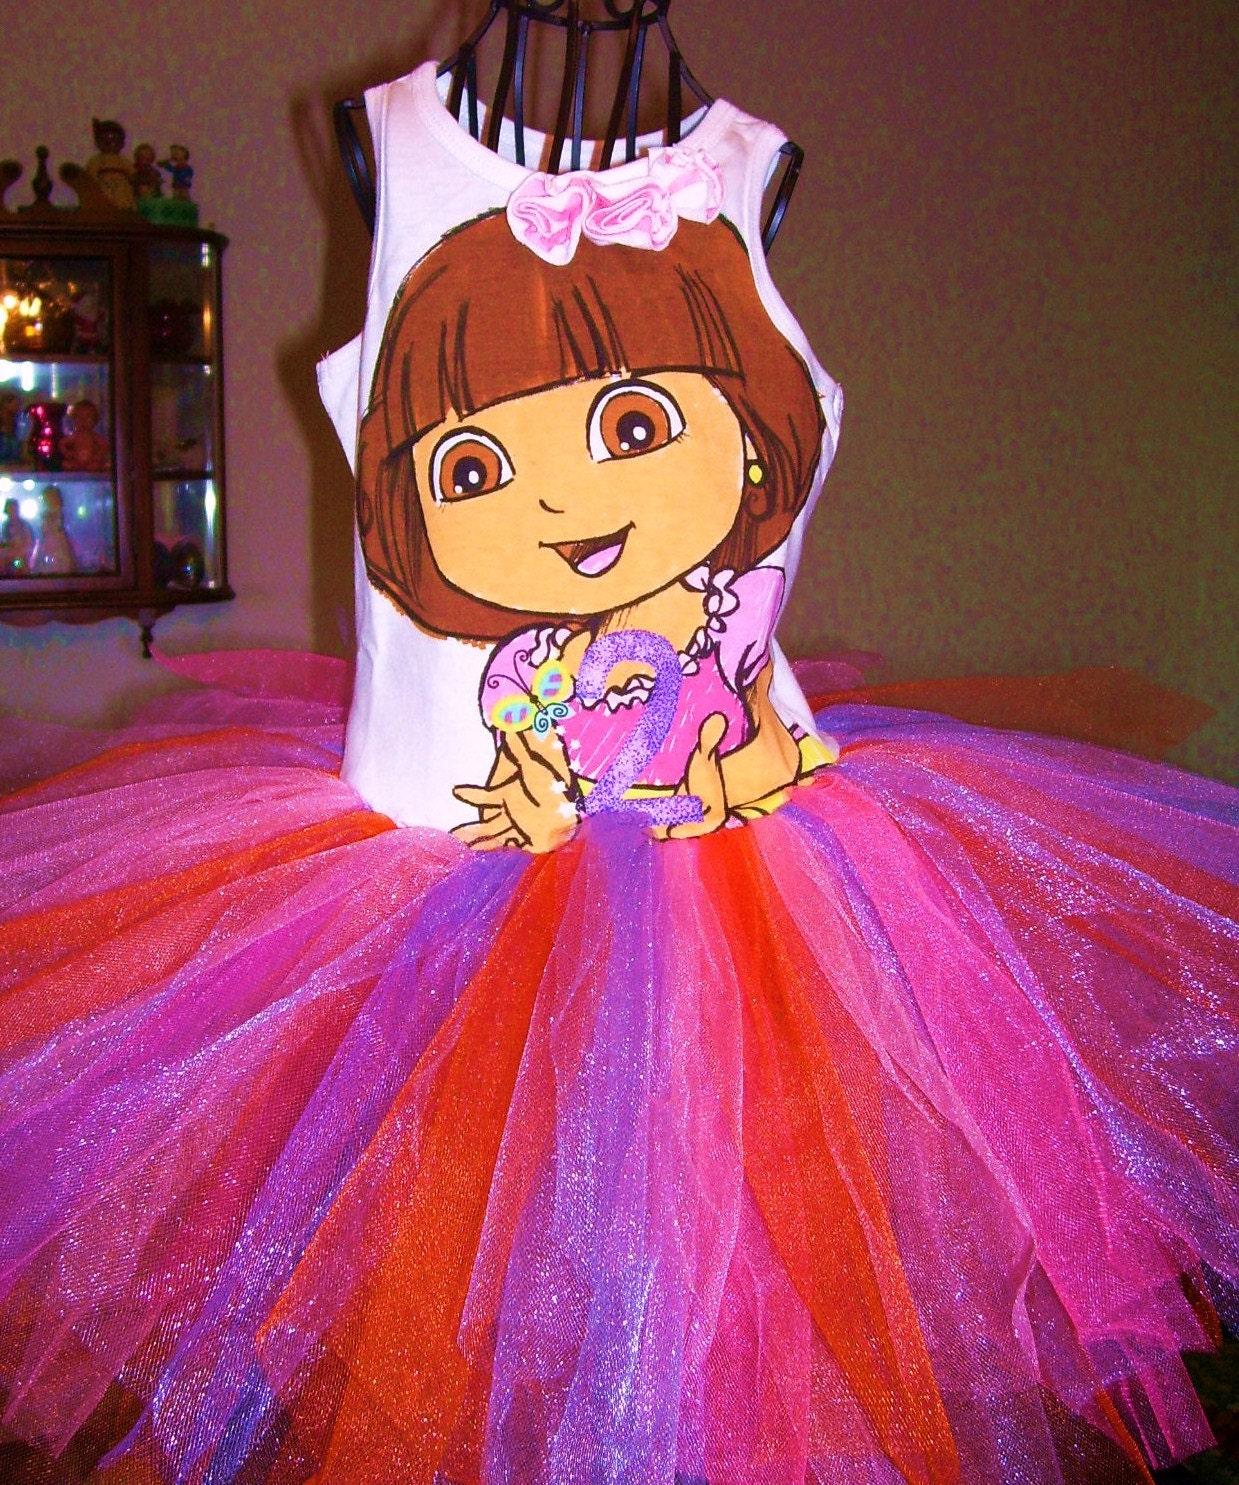 DORA the Explorer Tutu Dress Size 12 months by